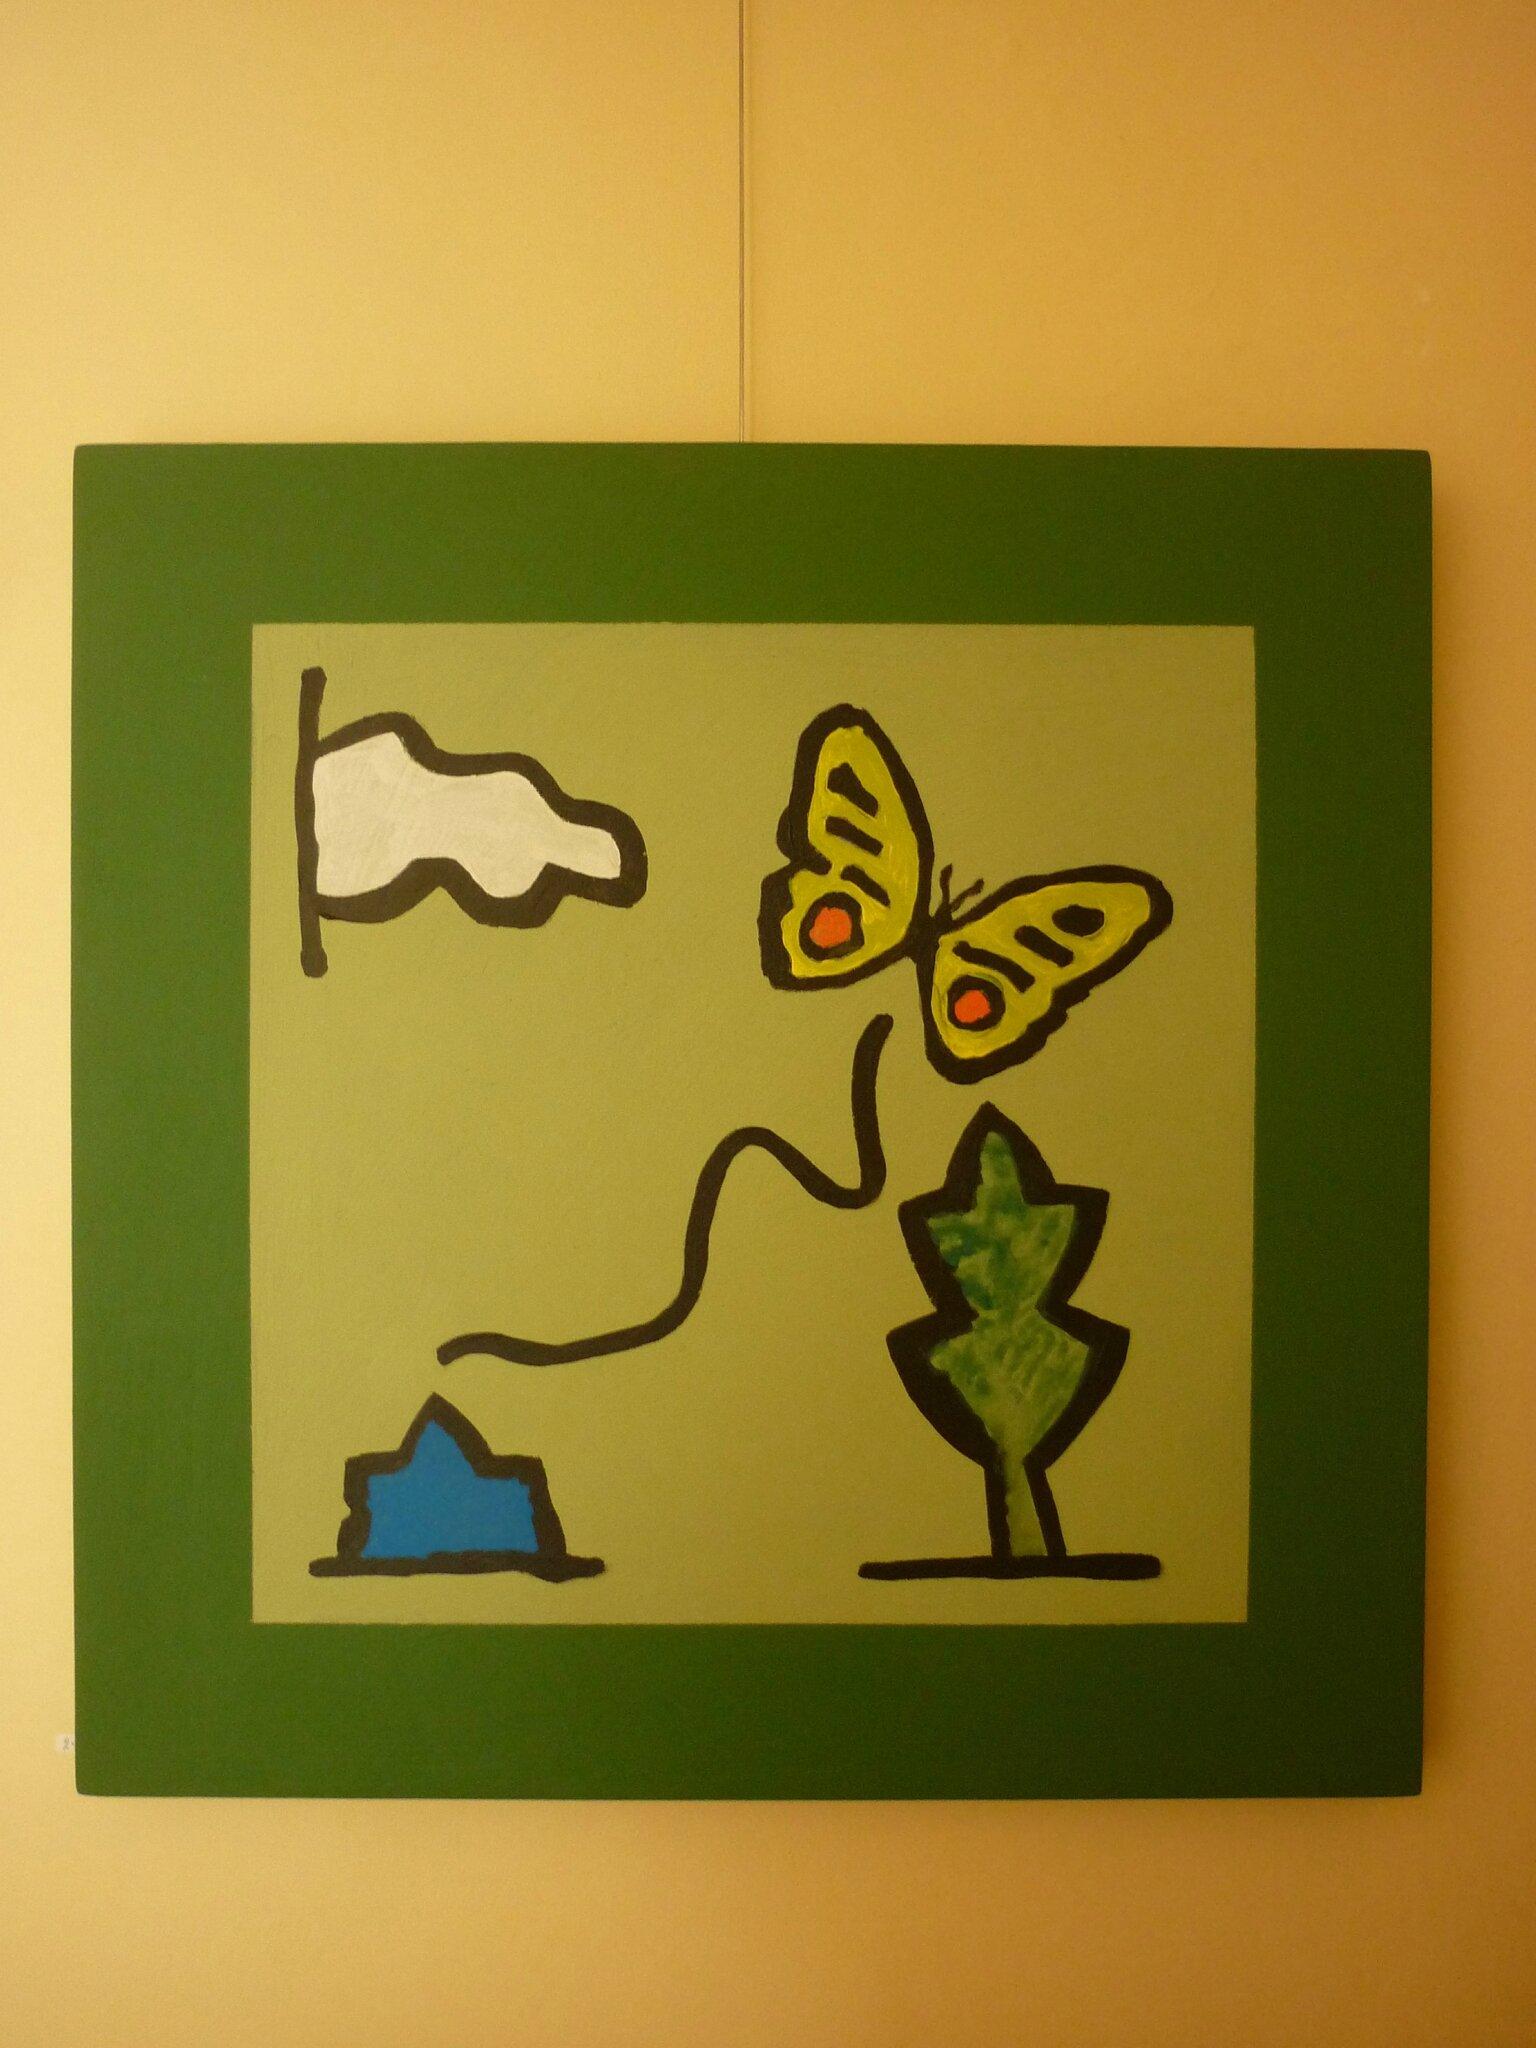 FAUVILLE papillon